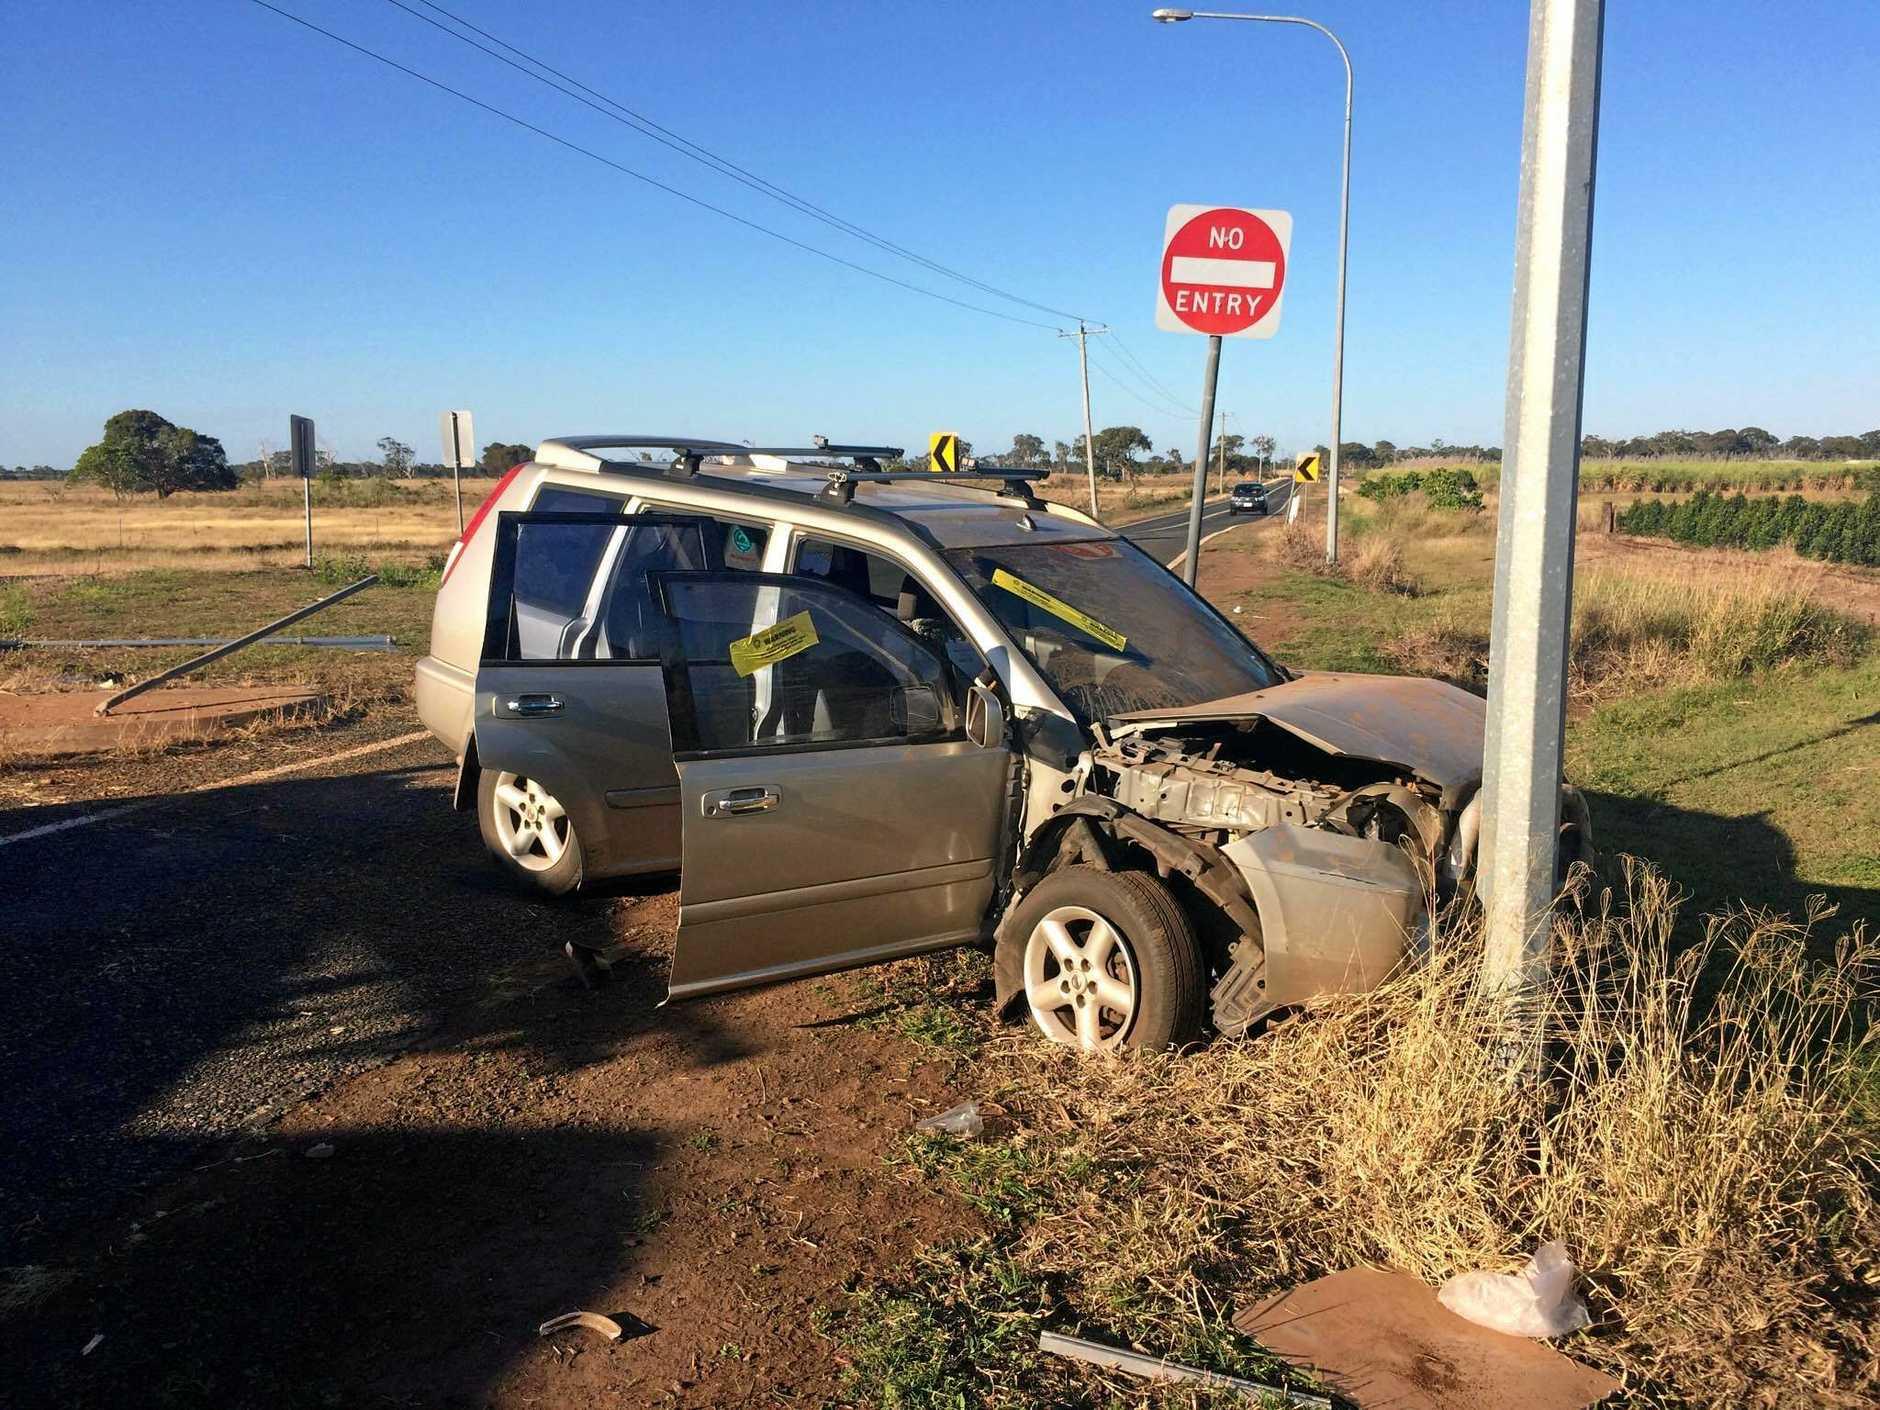 The scene of single-vehicle crash into a power pole.